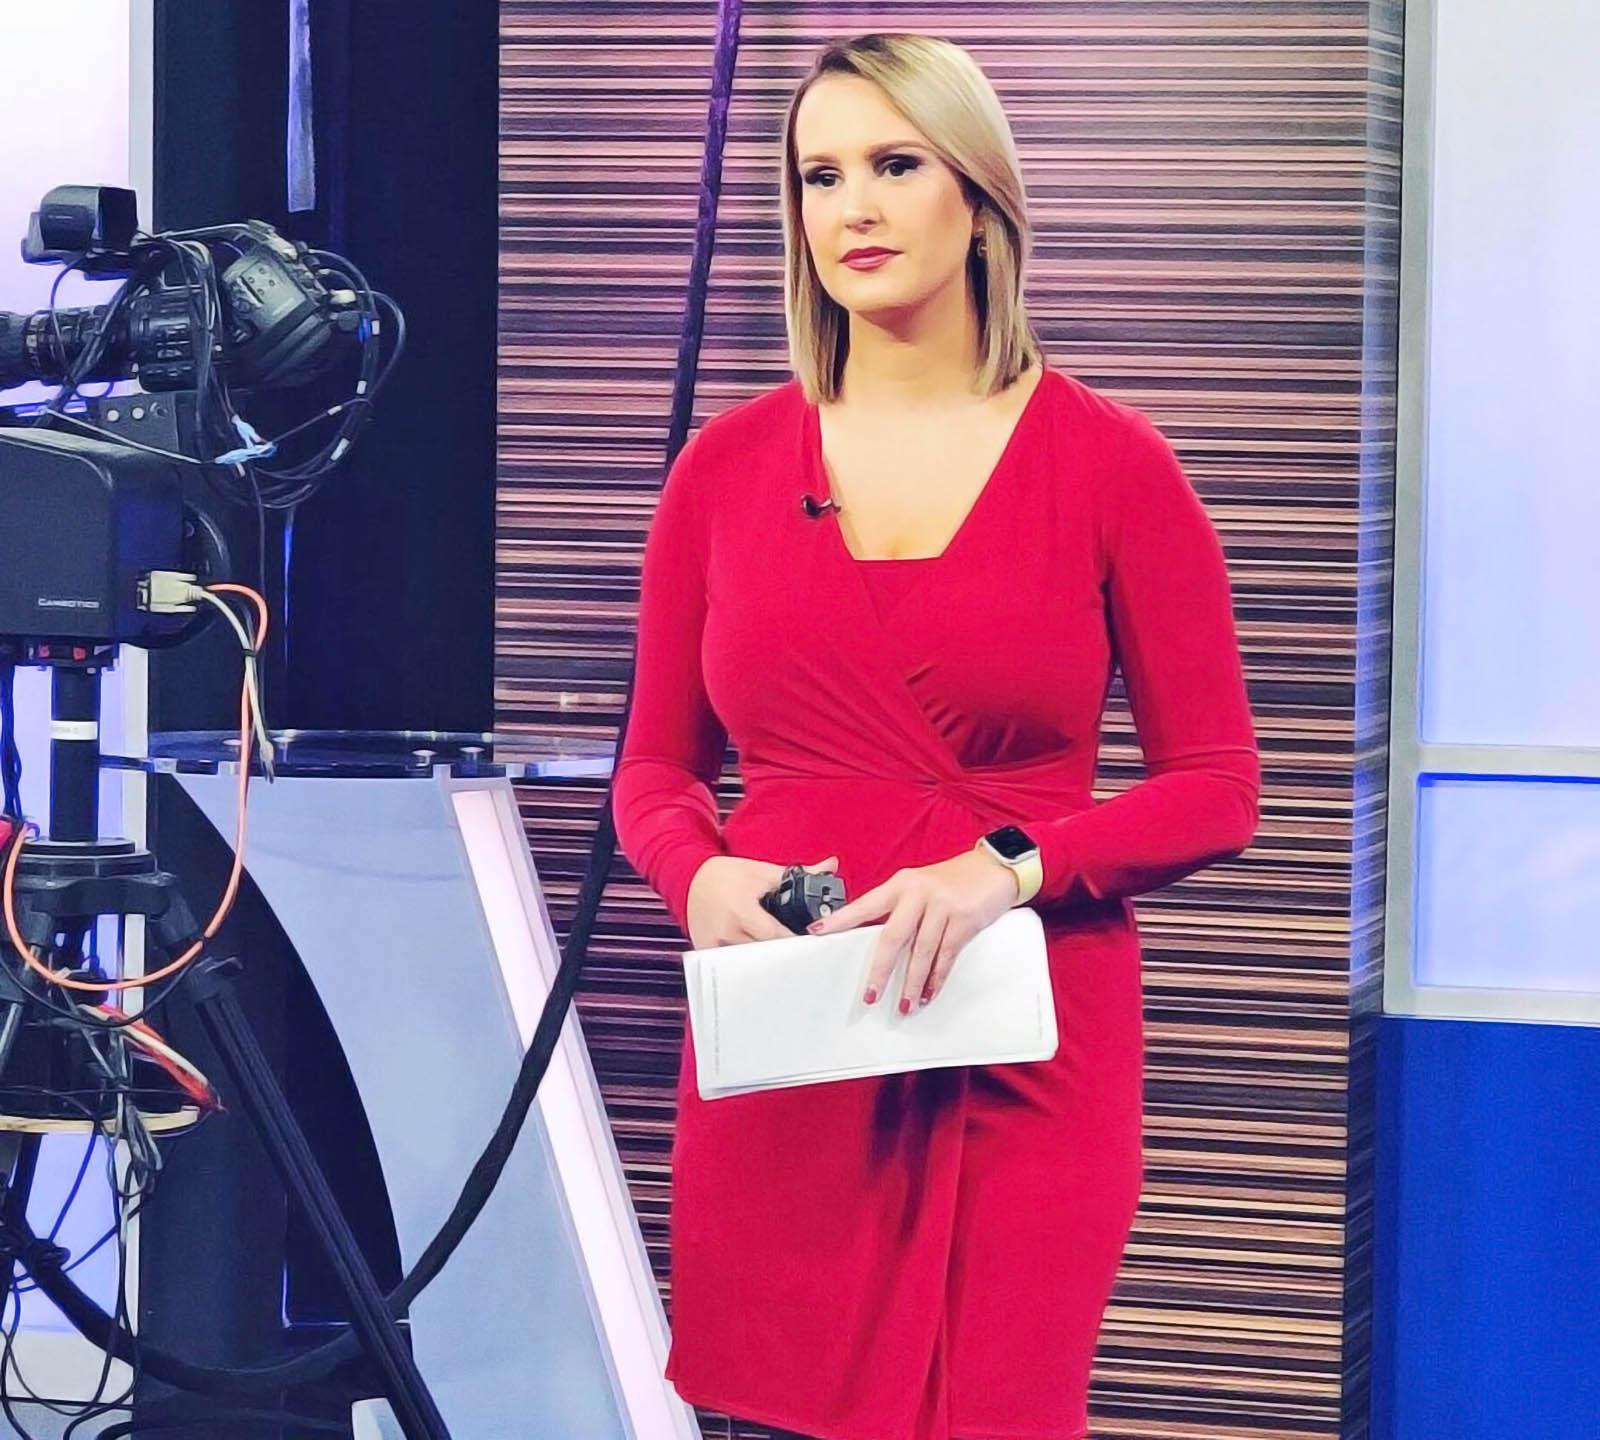 WILX News anchors ready on camera